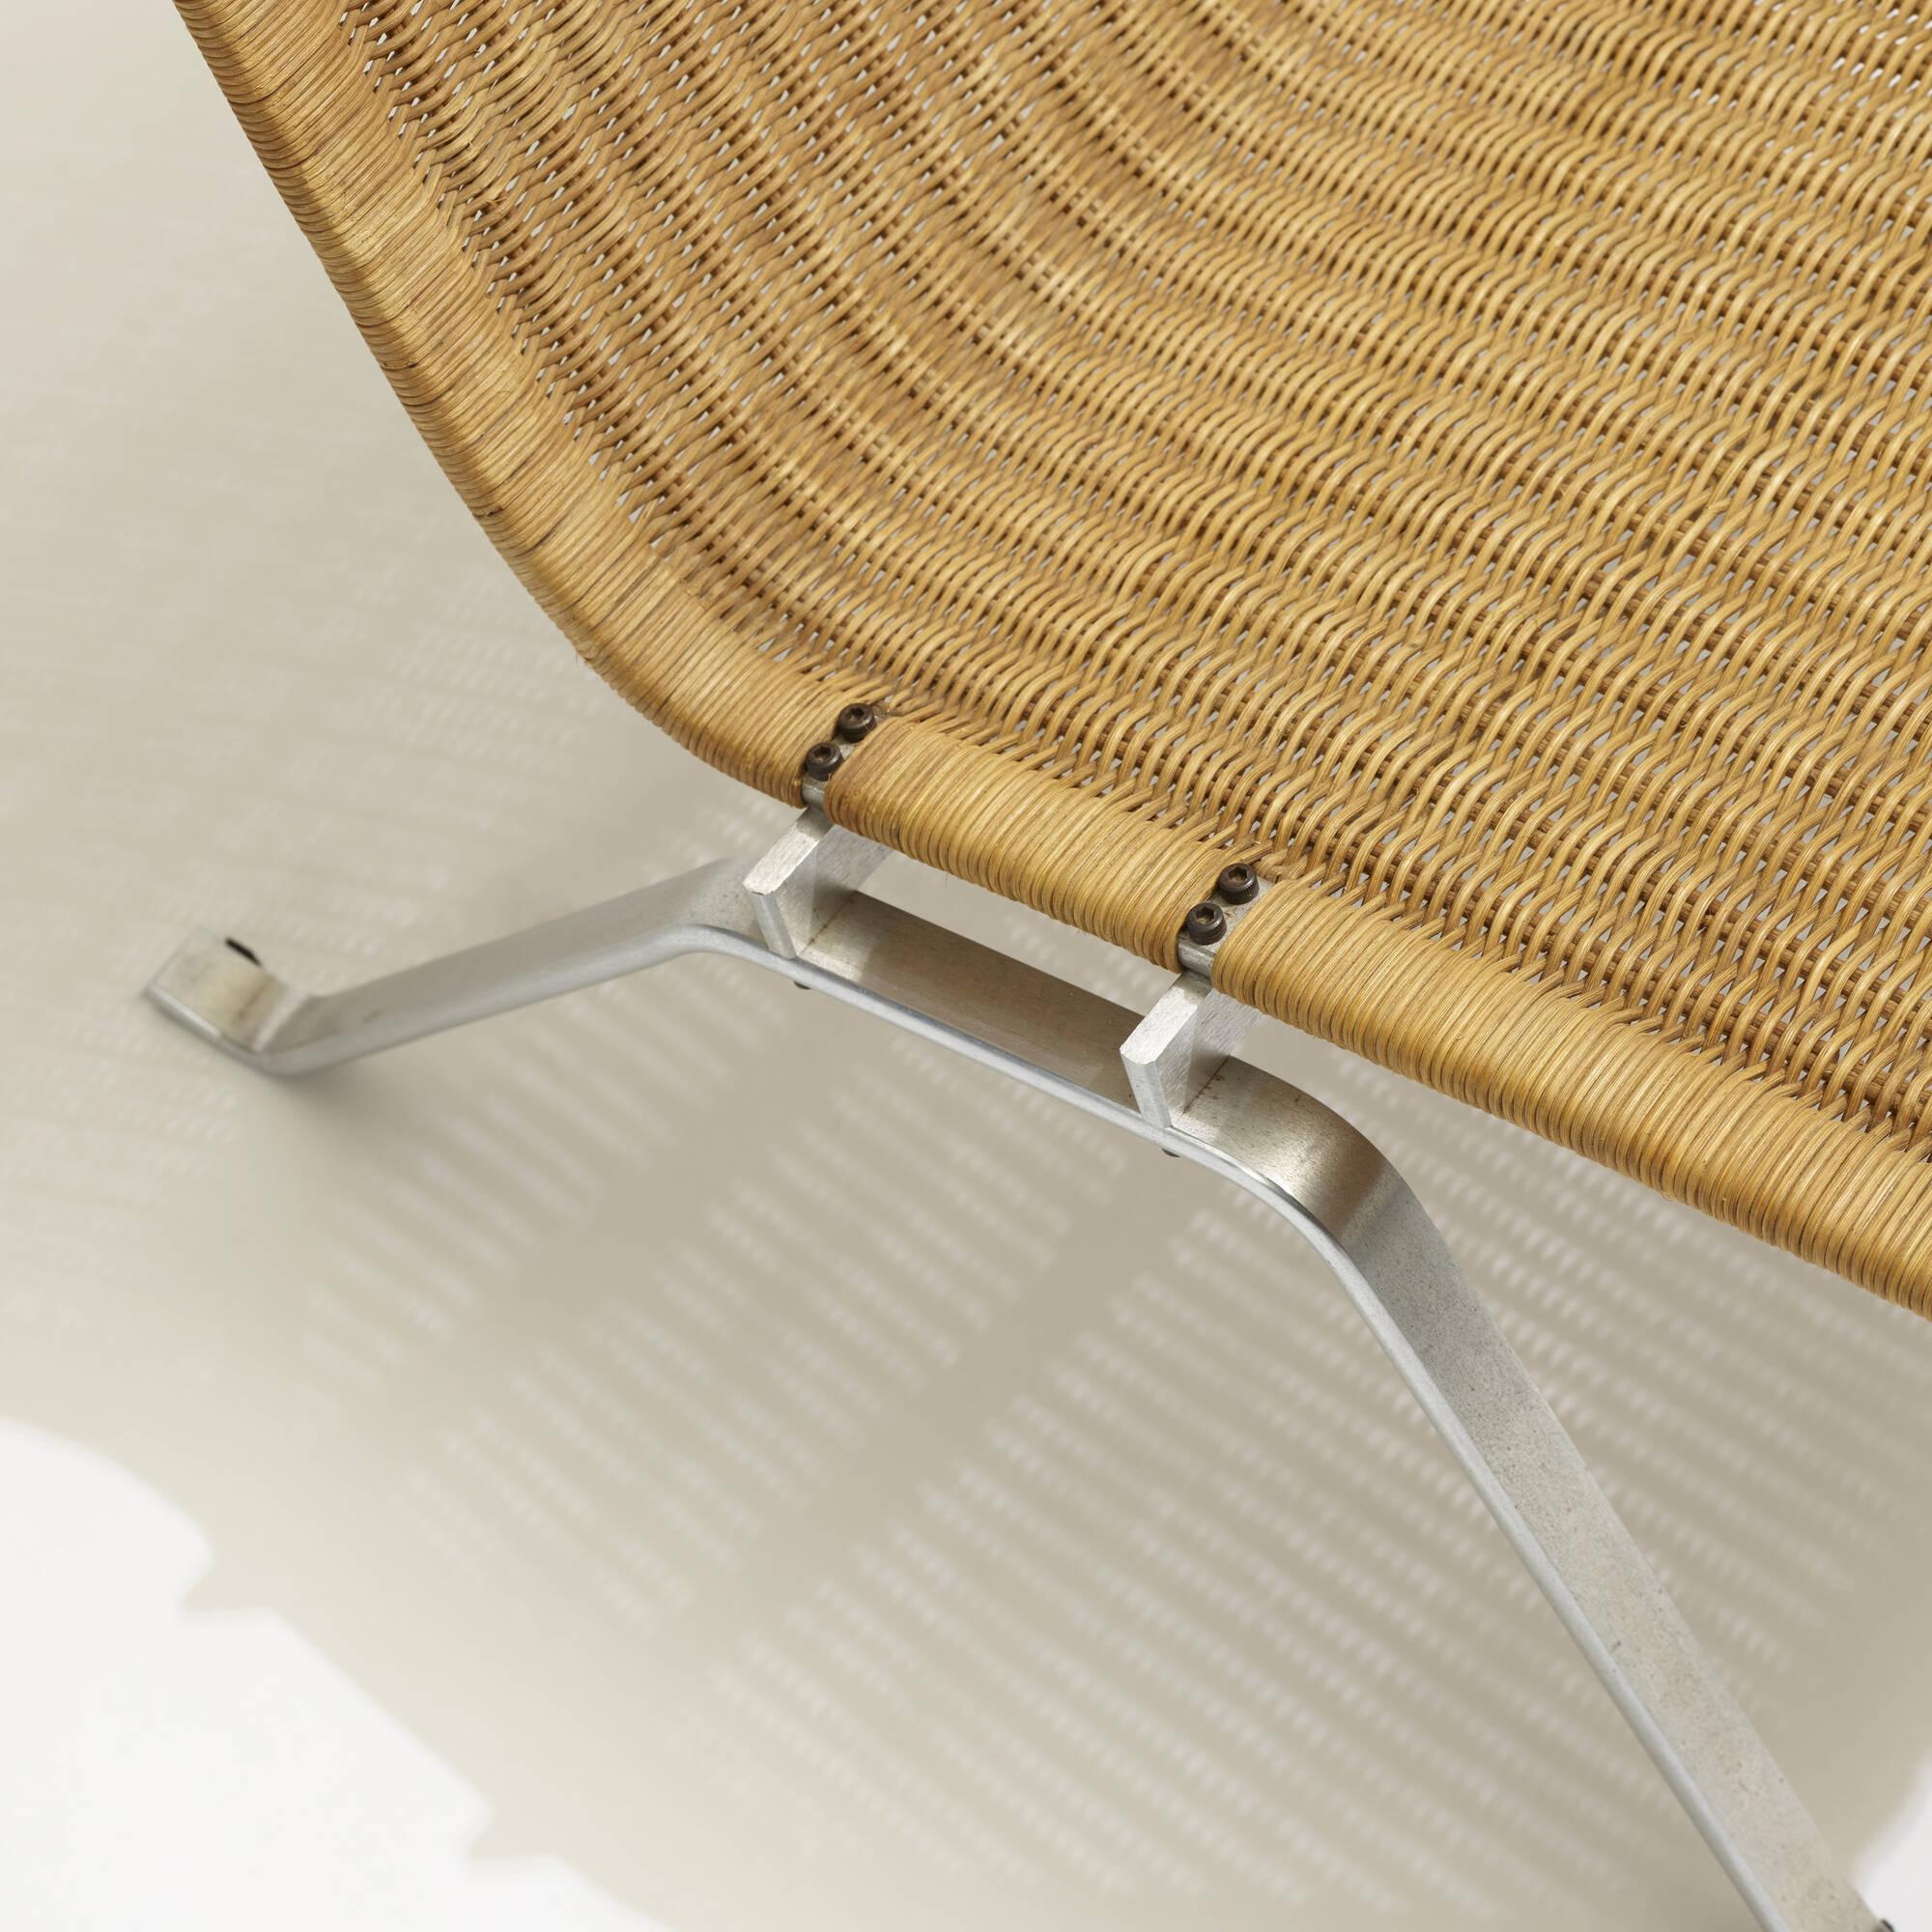 305: Poul Kjaerholm / PK-22 chairs, pair (3 of 4)